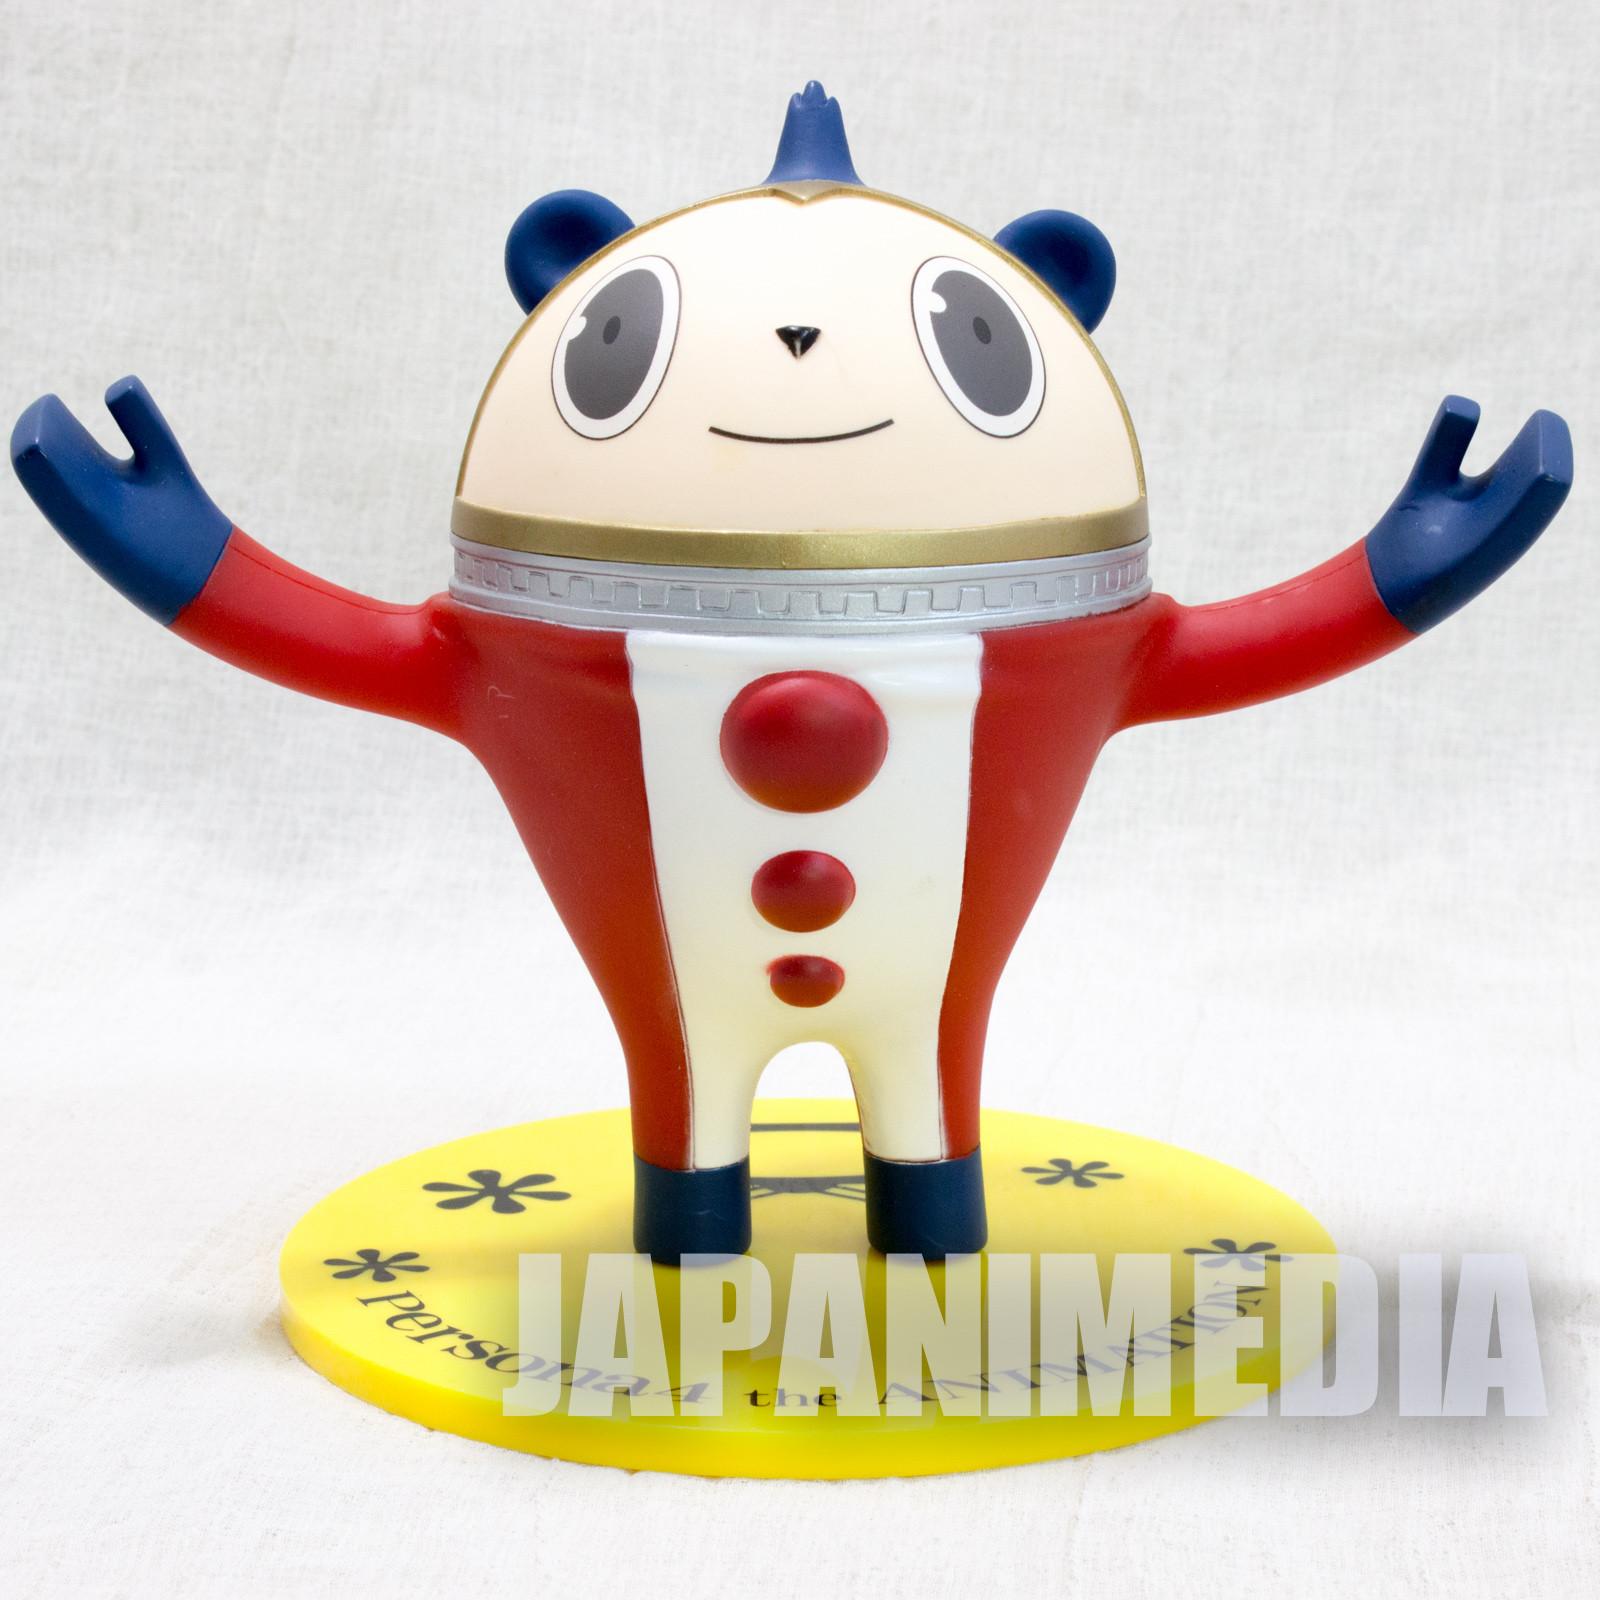 P4 Persona 4 the Animation Prize D Kuma Figure Glasses Stand Figure JAPAN